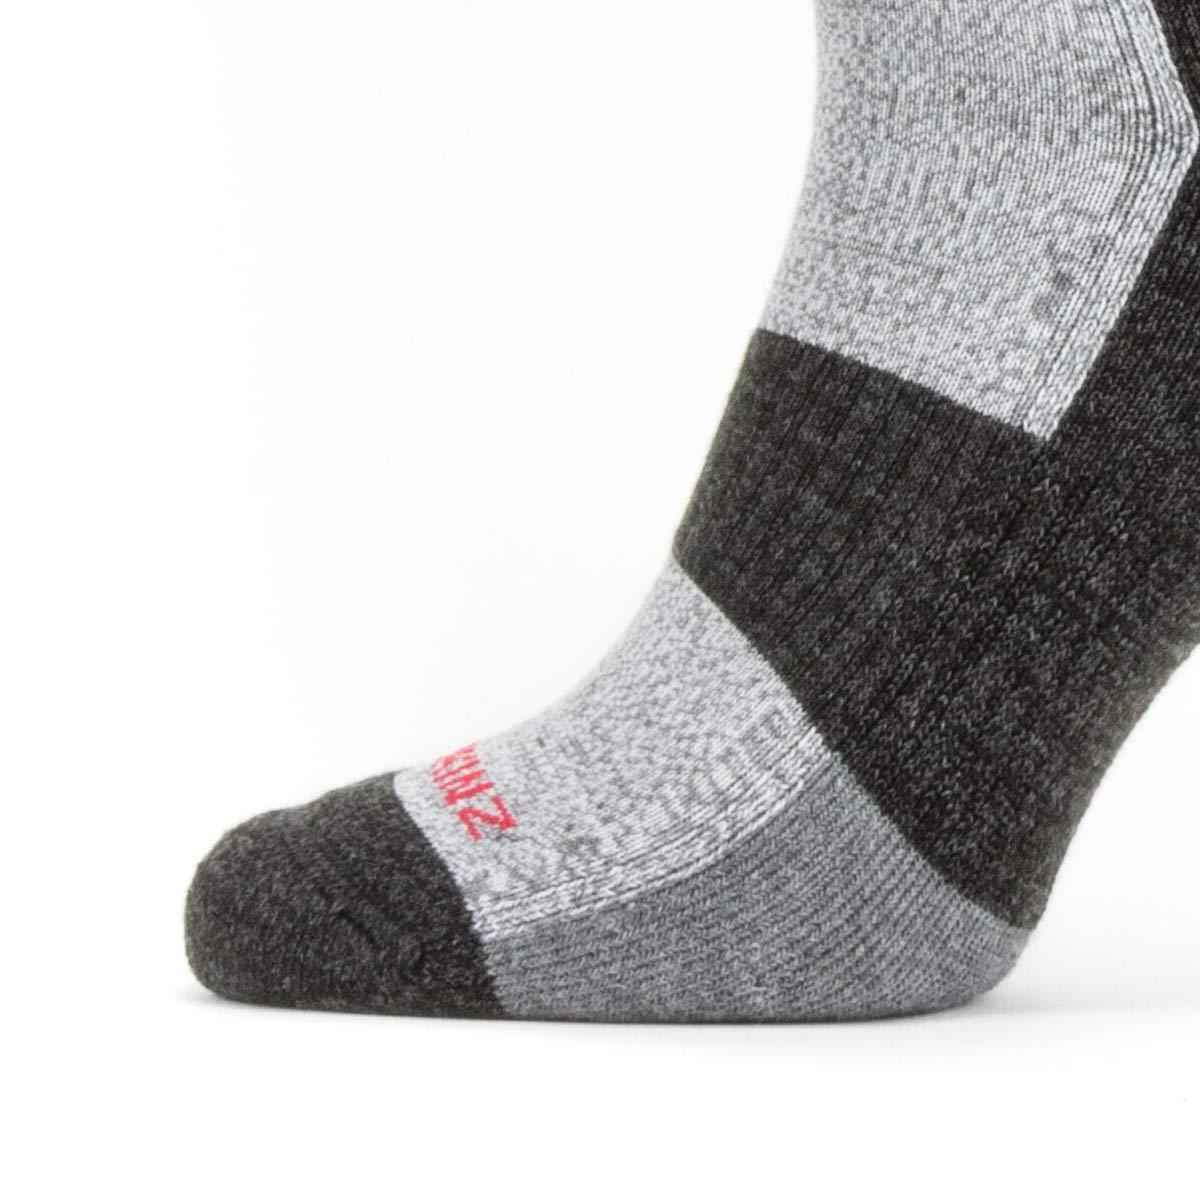 SealSkinz Herren Solo Quickdry Mid Length Socke